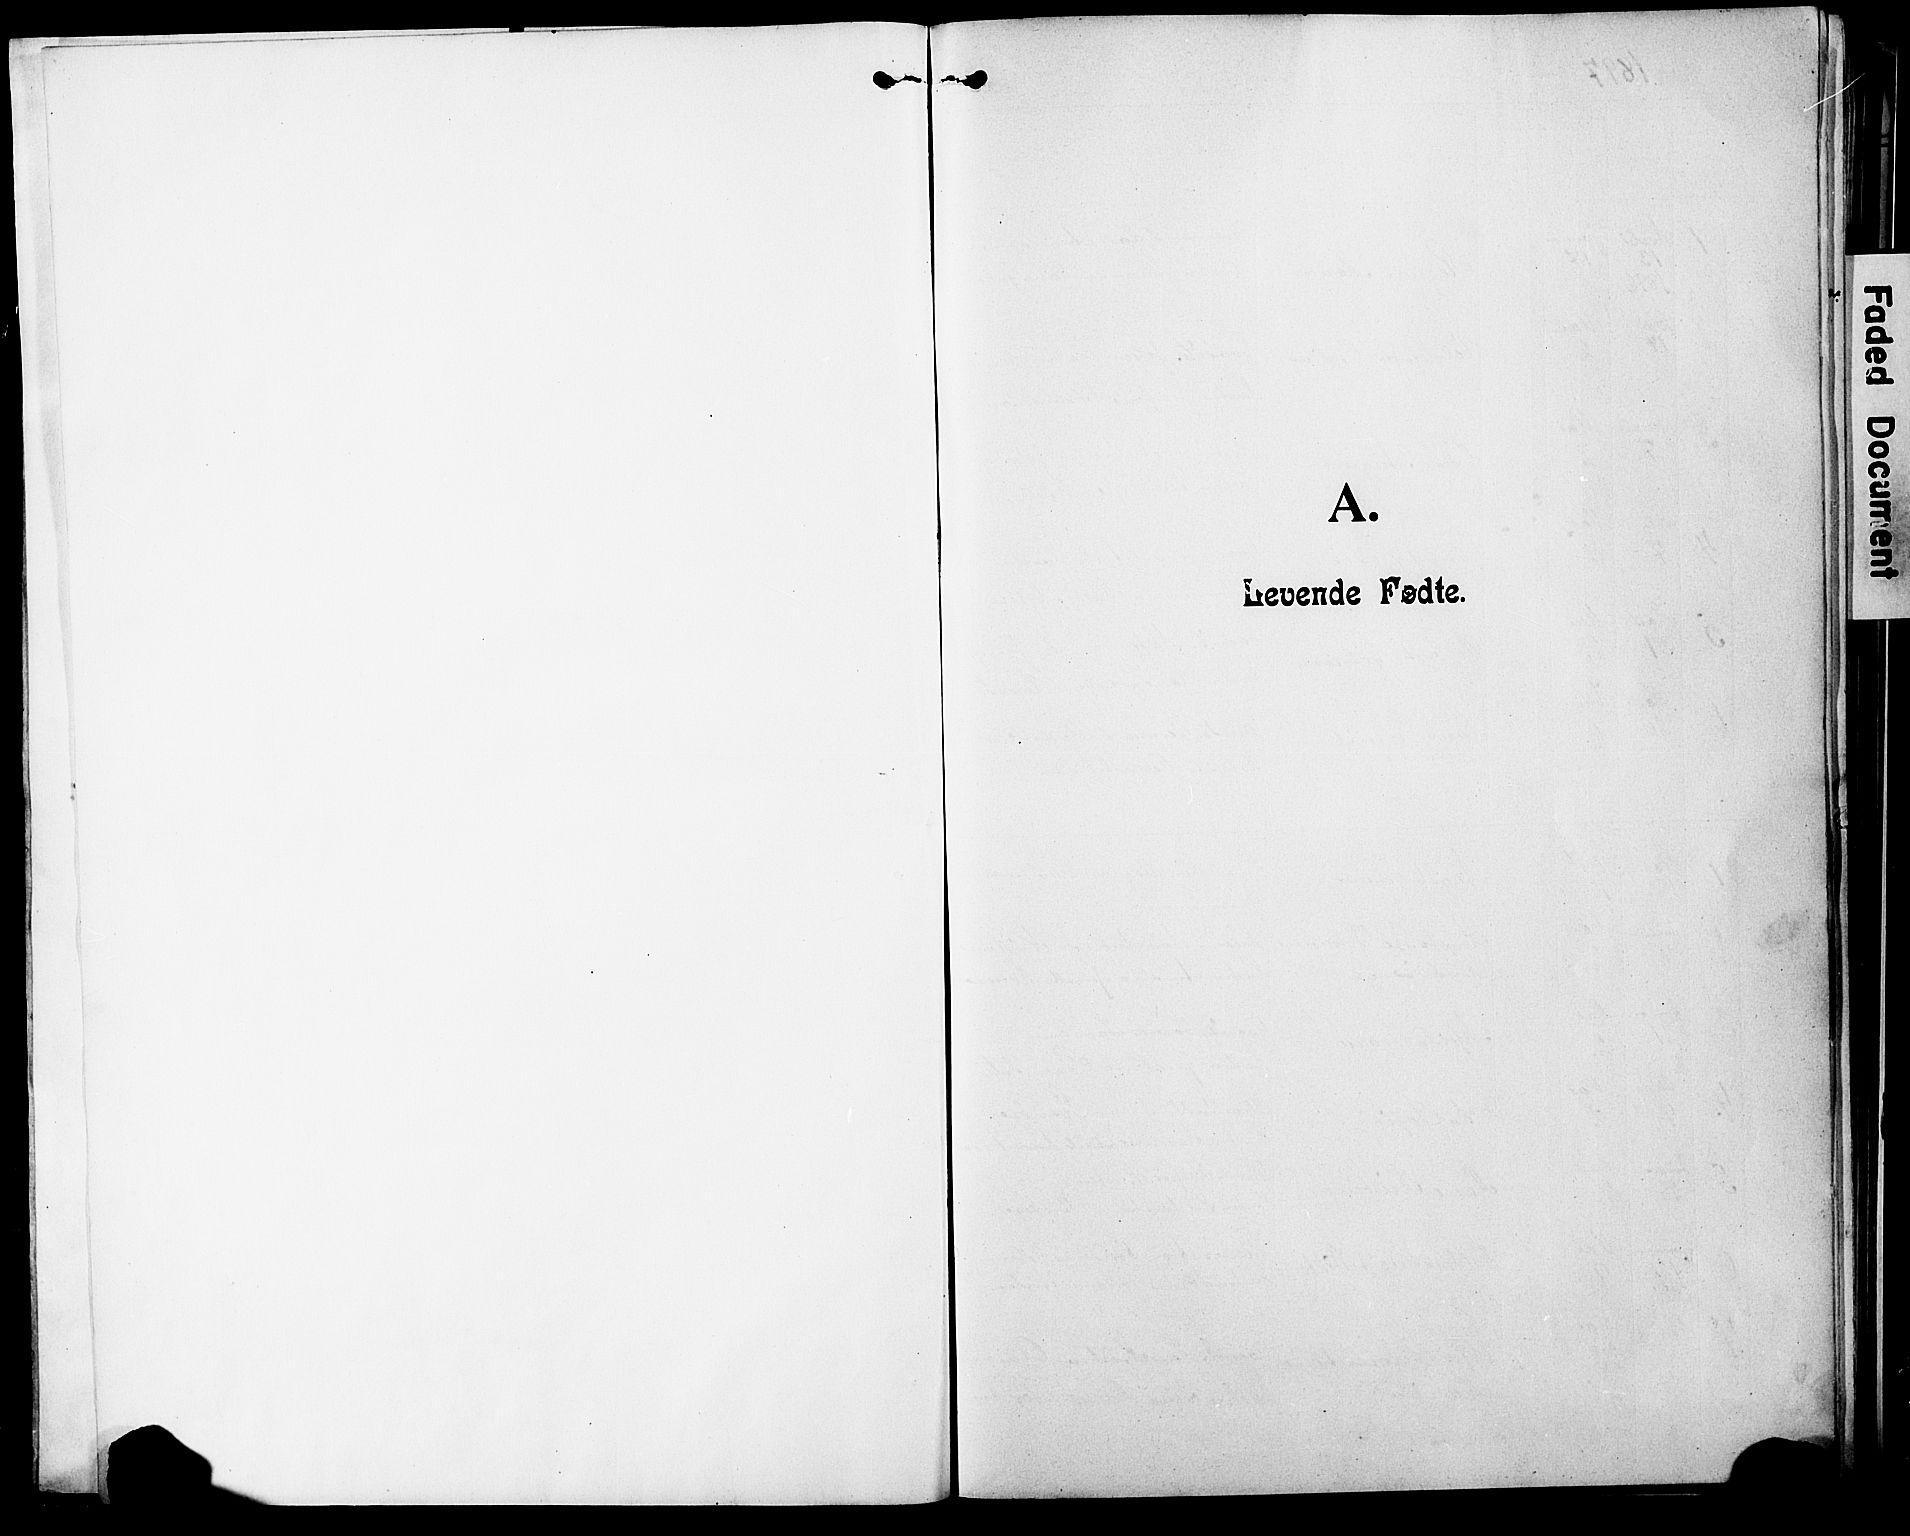 SAT, Ministerialprotokoller, klokkerbøker og fødselsregistre - Nordland, 803/L0077: Klokkerbok nr. 803C04, 1897-1930